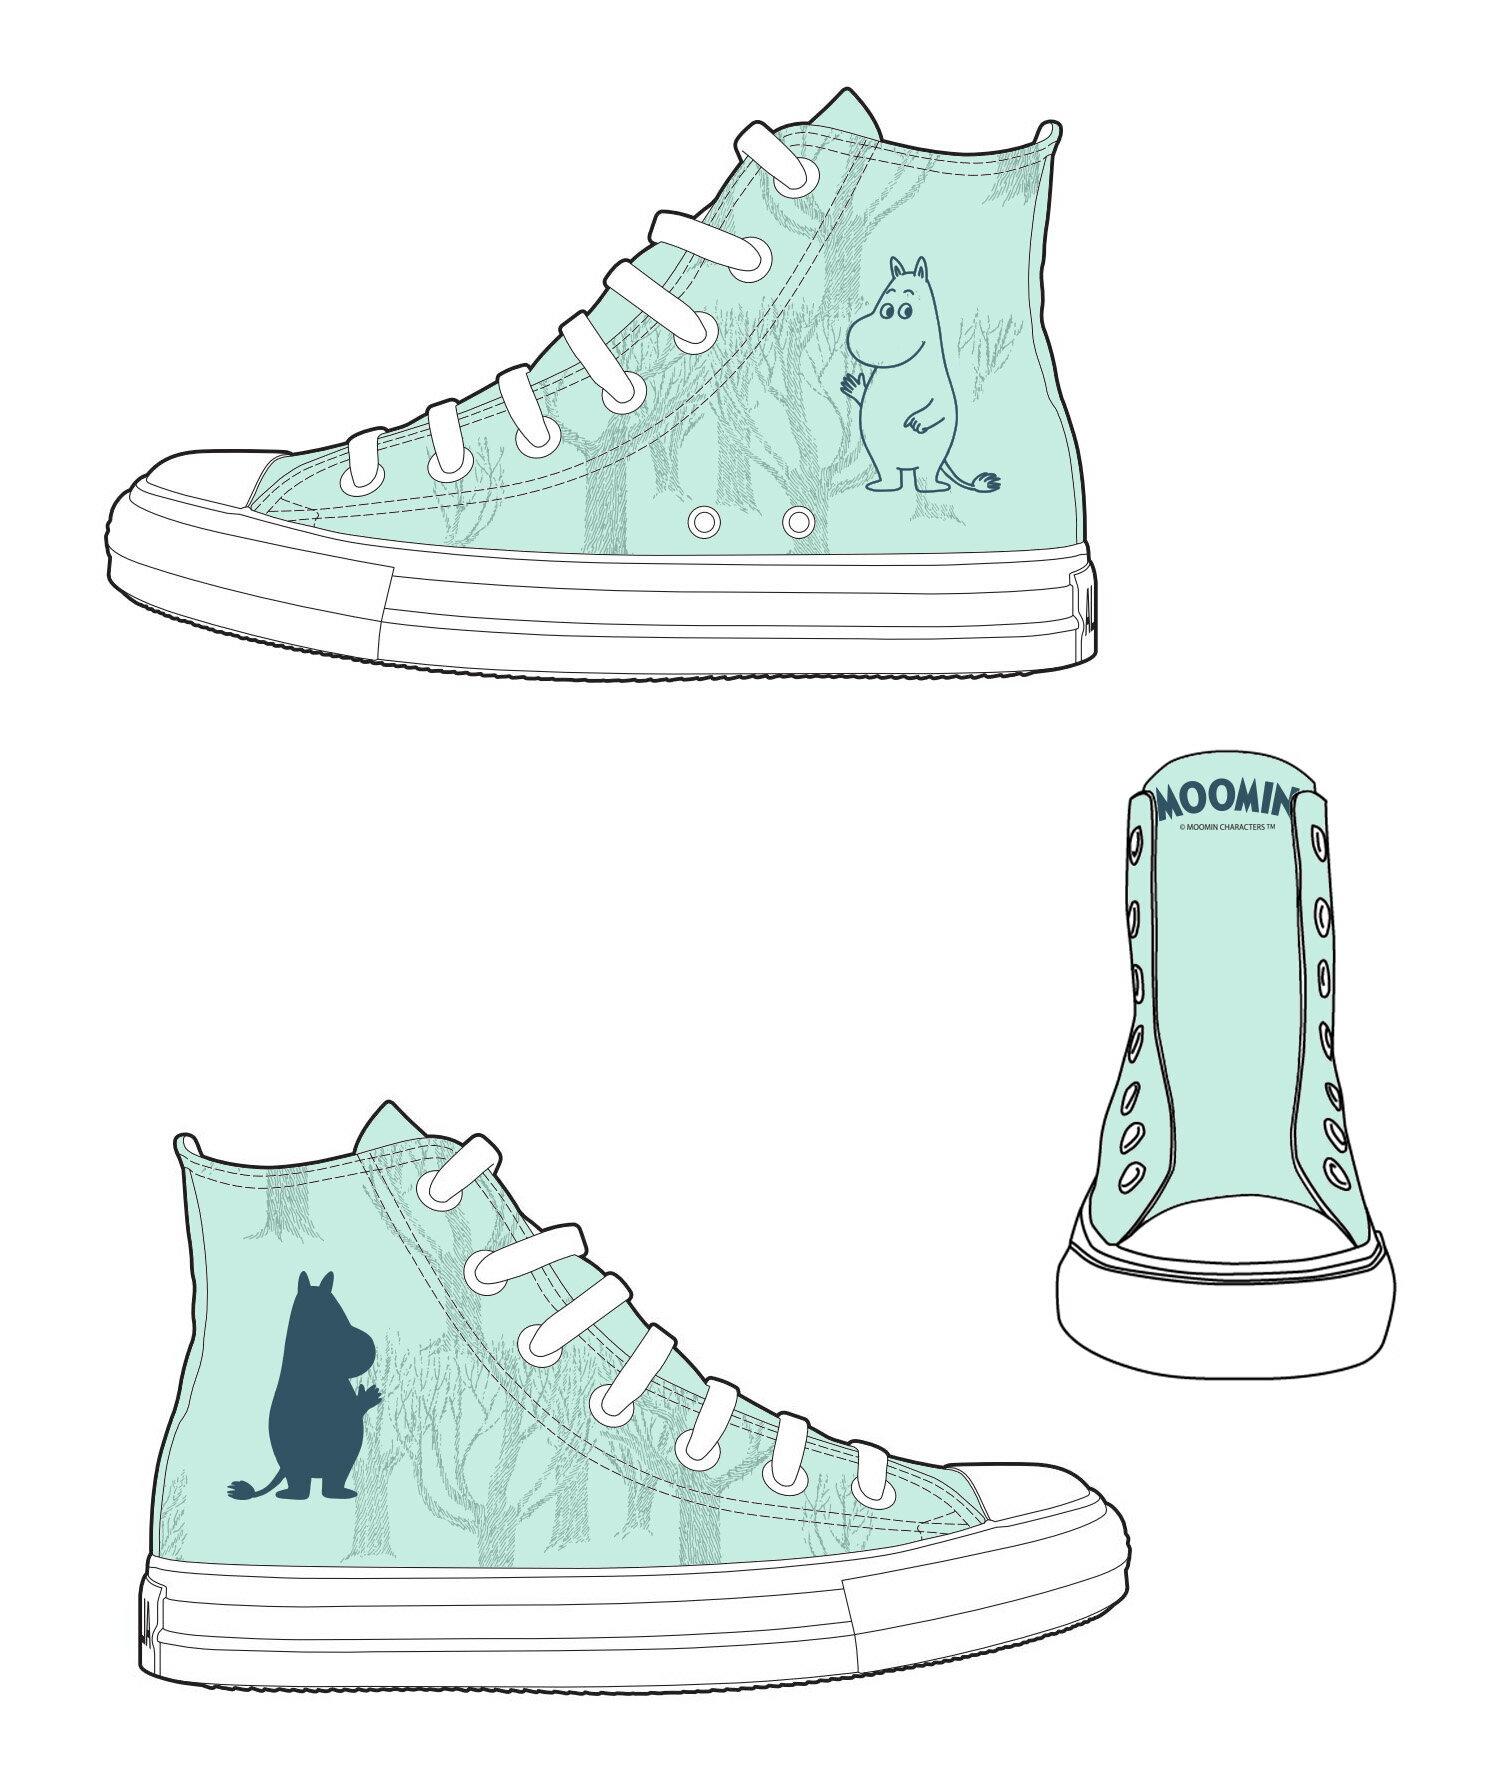 【Moomin】AE23 (綠鞋白帶) - 帆布鞋 (女款限定版)